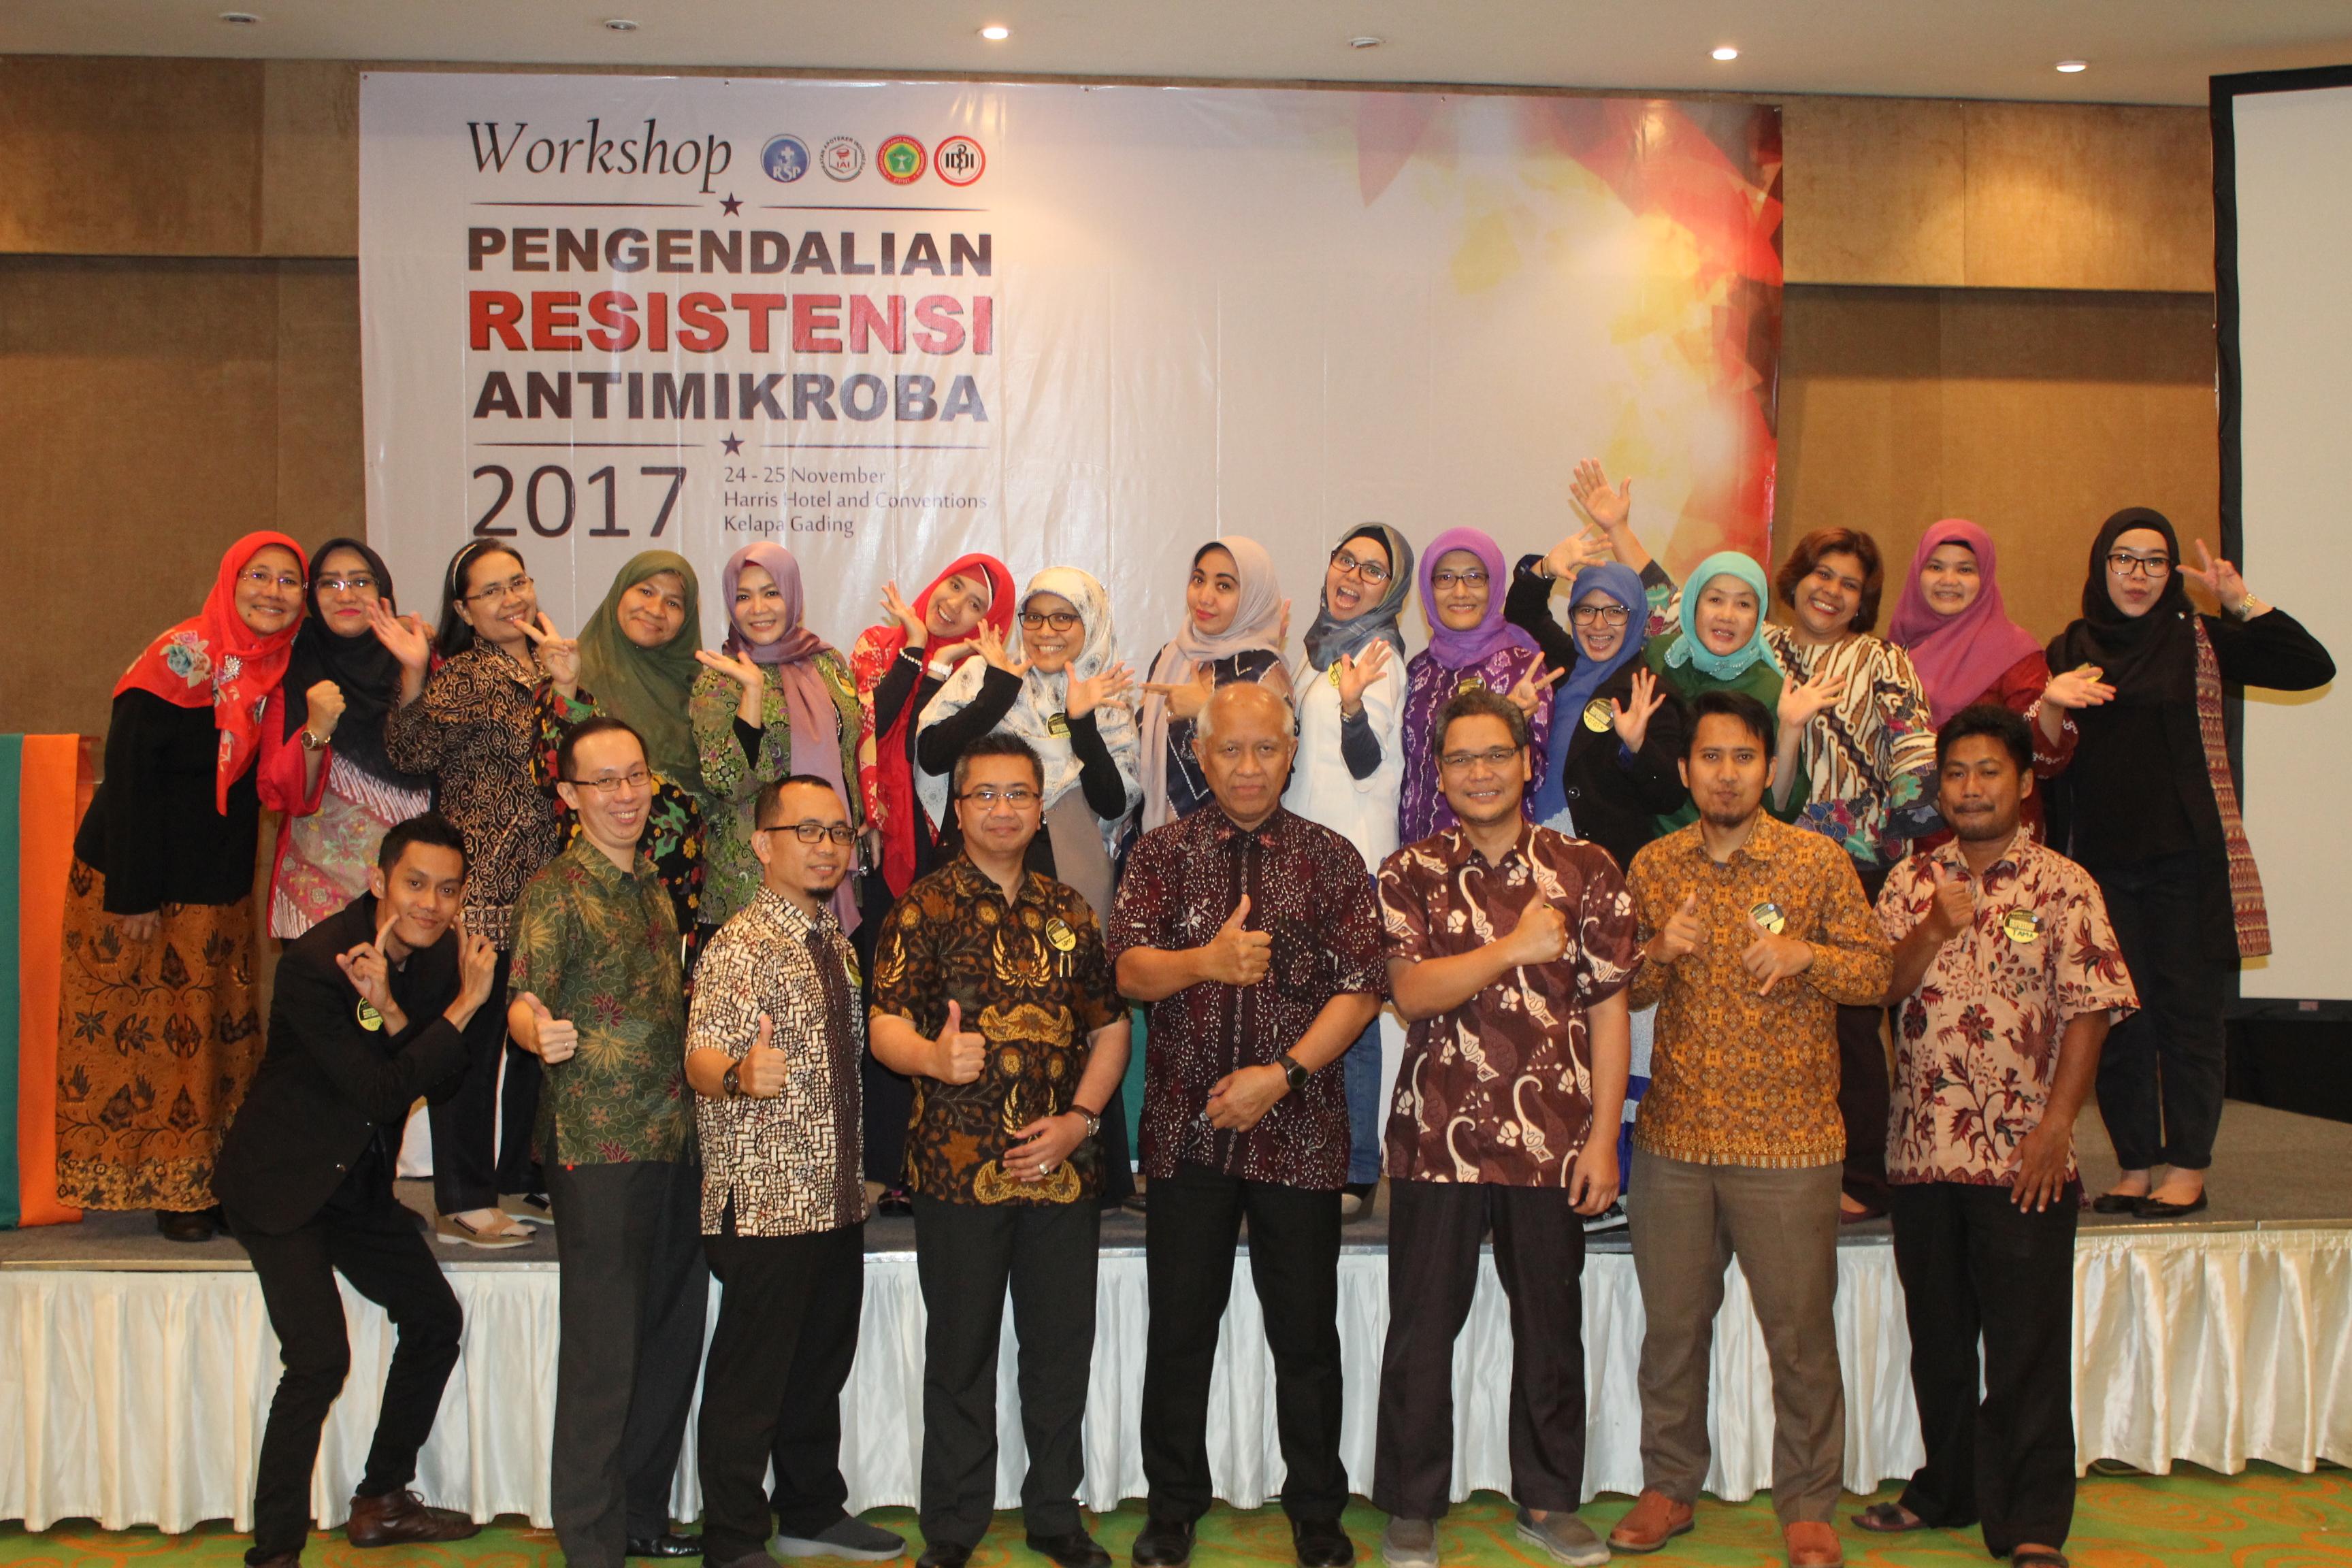 WORKSHOP  Pengendalian Resistensi Antimikroba